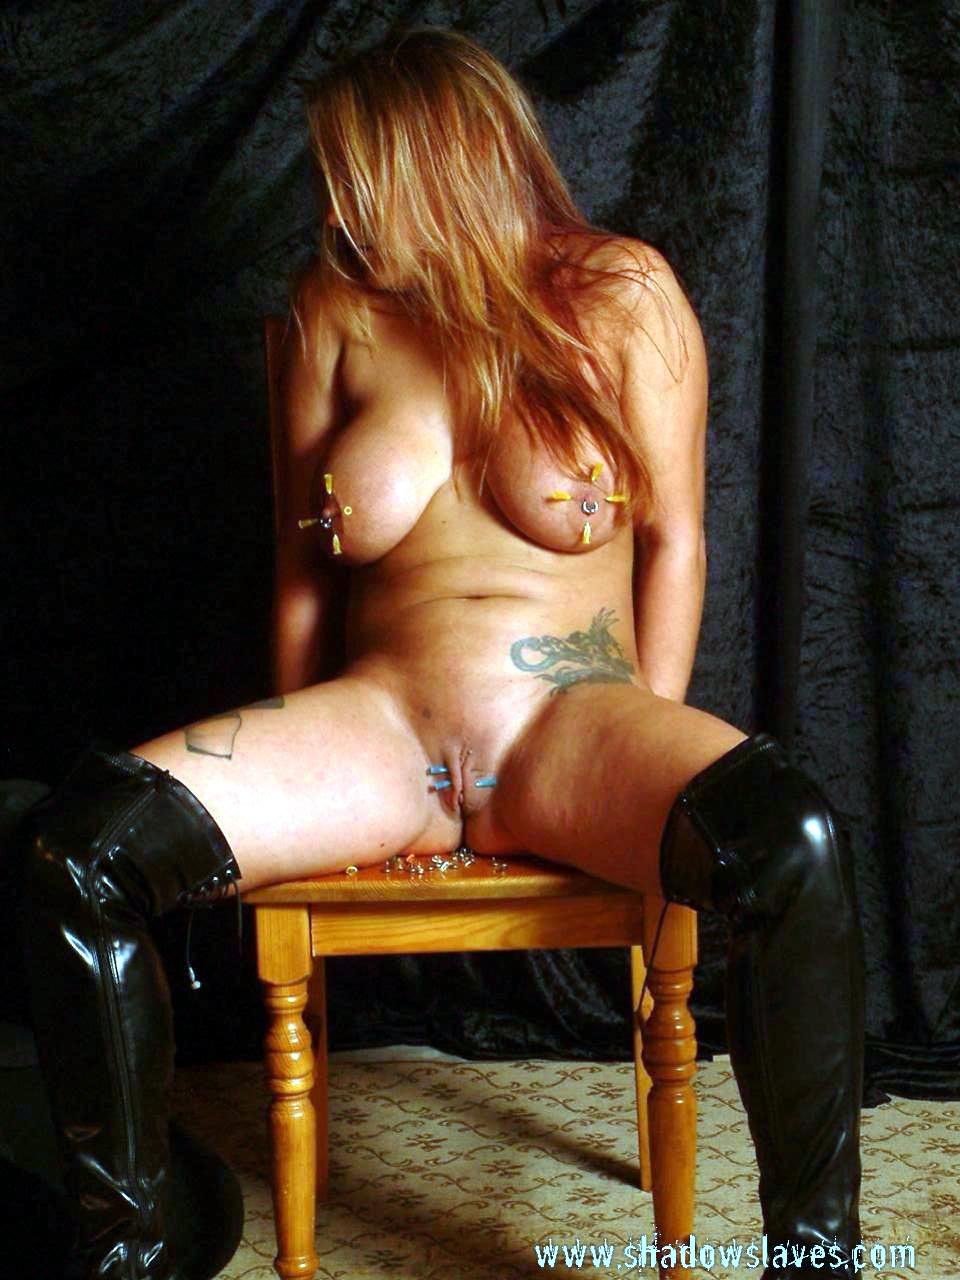 Jennifer krum nude pics